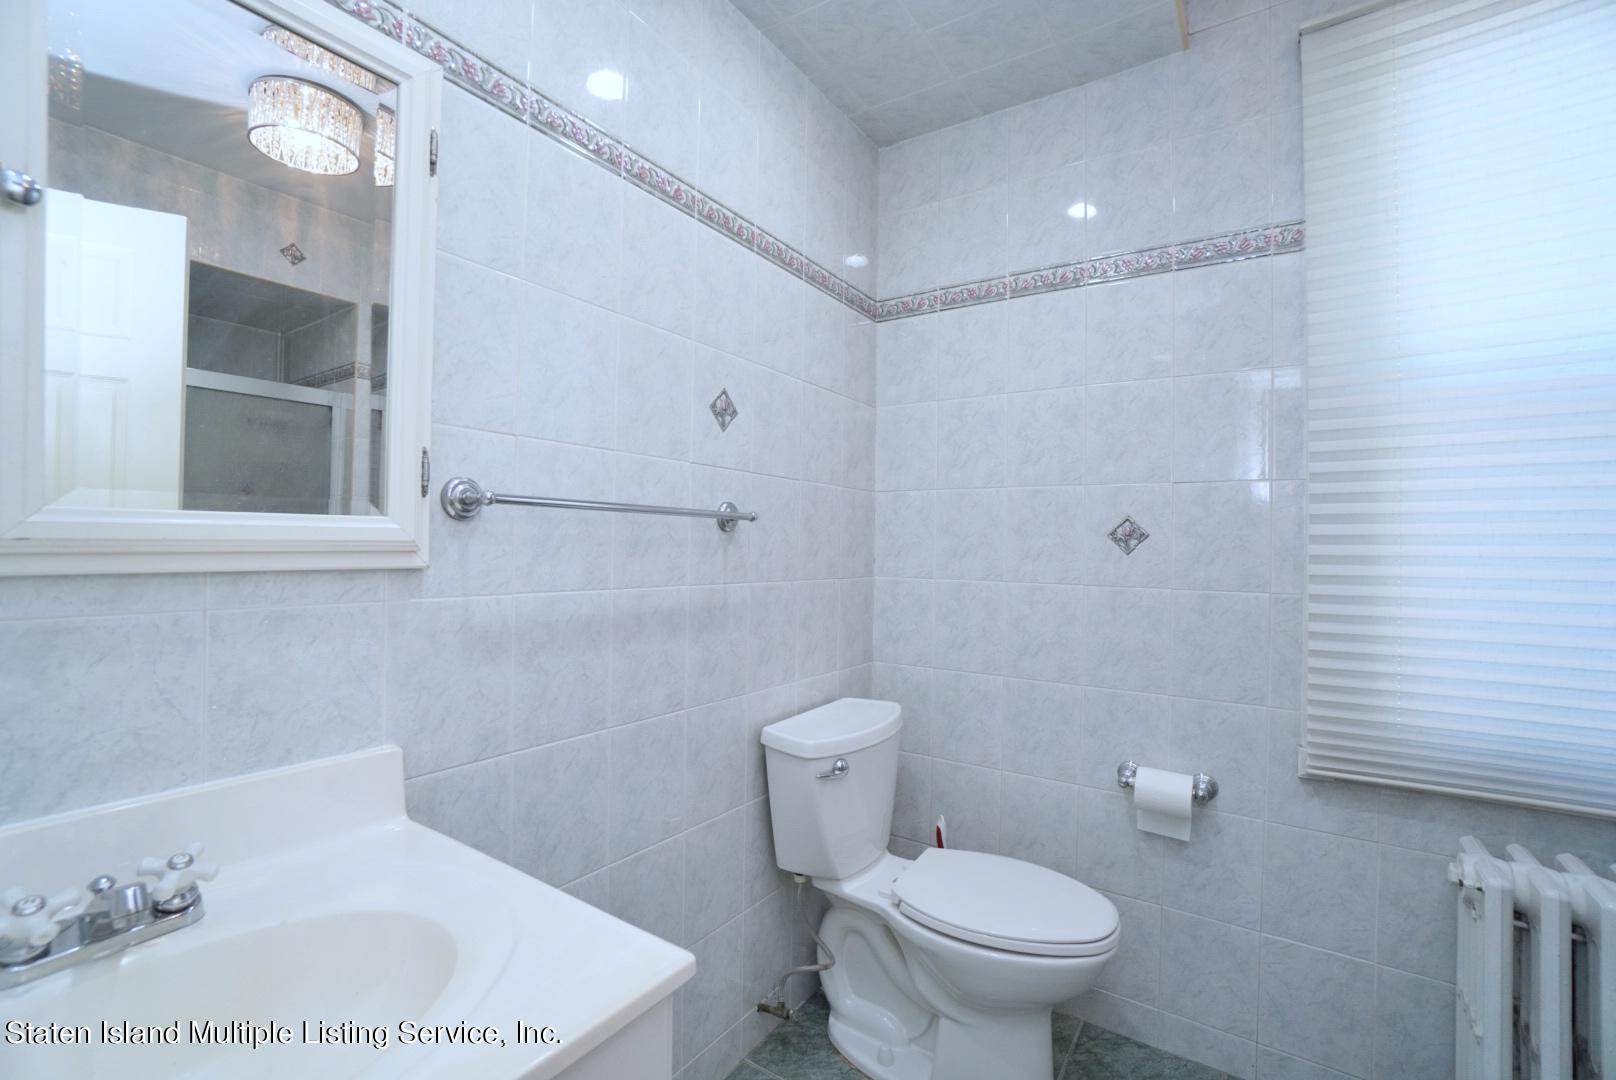 Single Family - Detached 264 Fisher Avenue  Staten Island, NY 10307, MLS-1146898-38